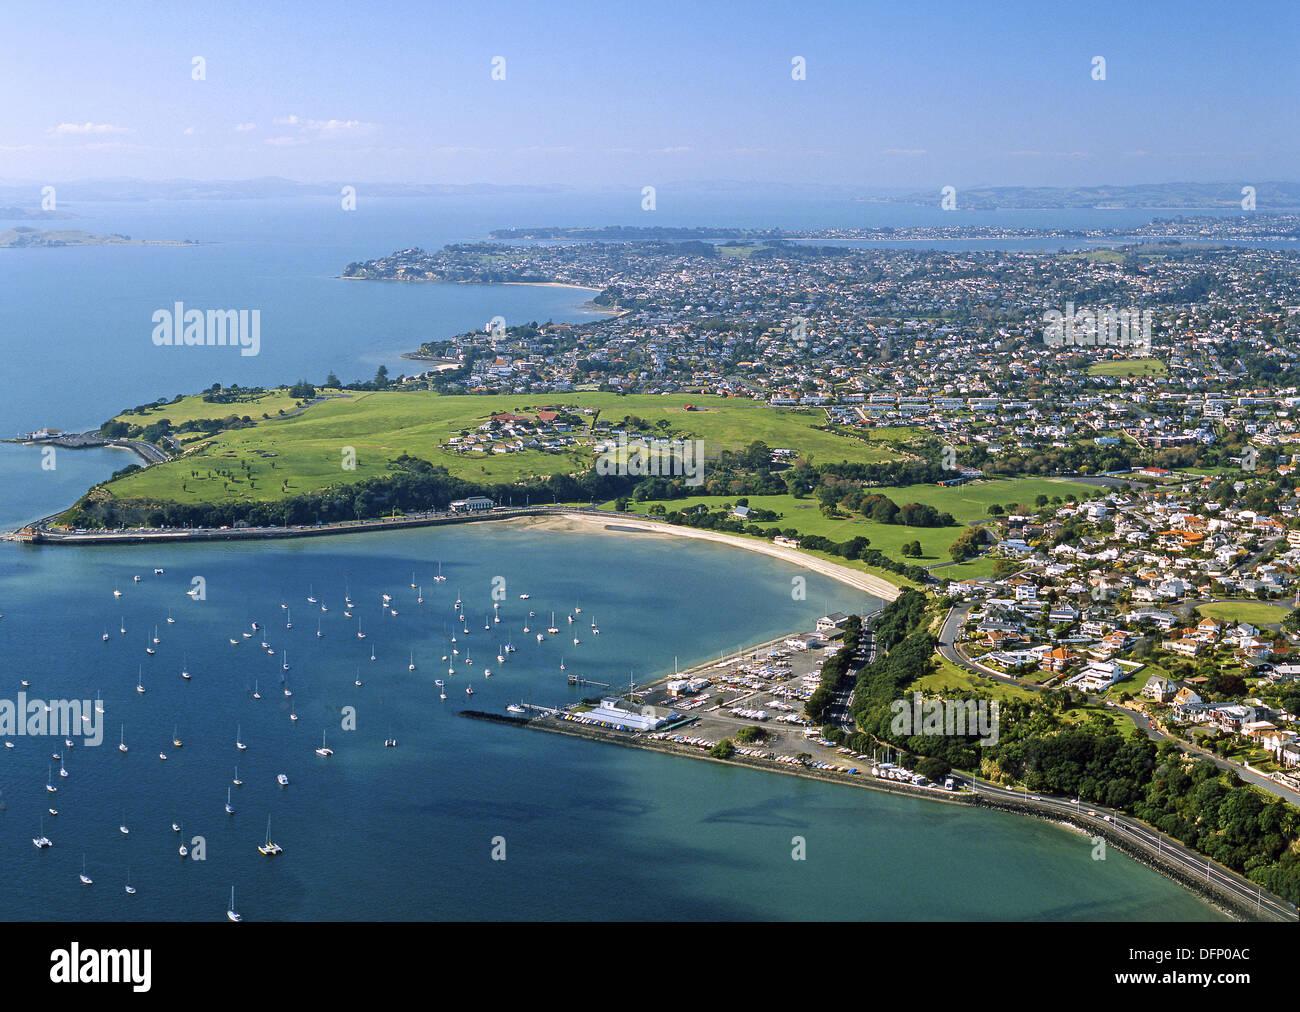 Bastion Point Okahu Bay Tamaki Yacht Club and Paratai Drive Orakei Auckland New Zealand - Stock Image